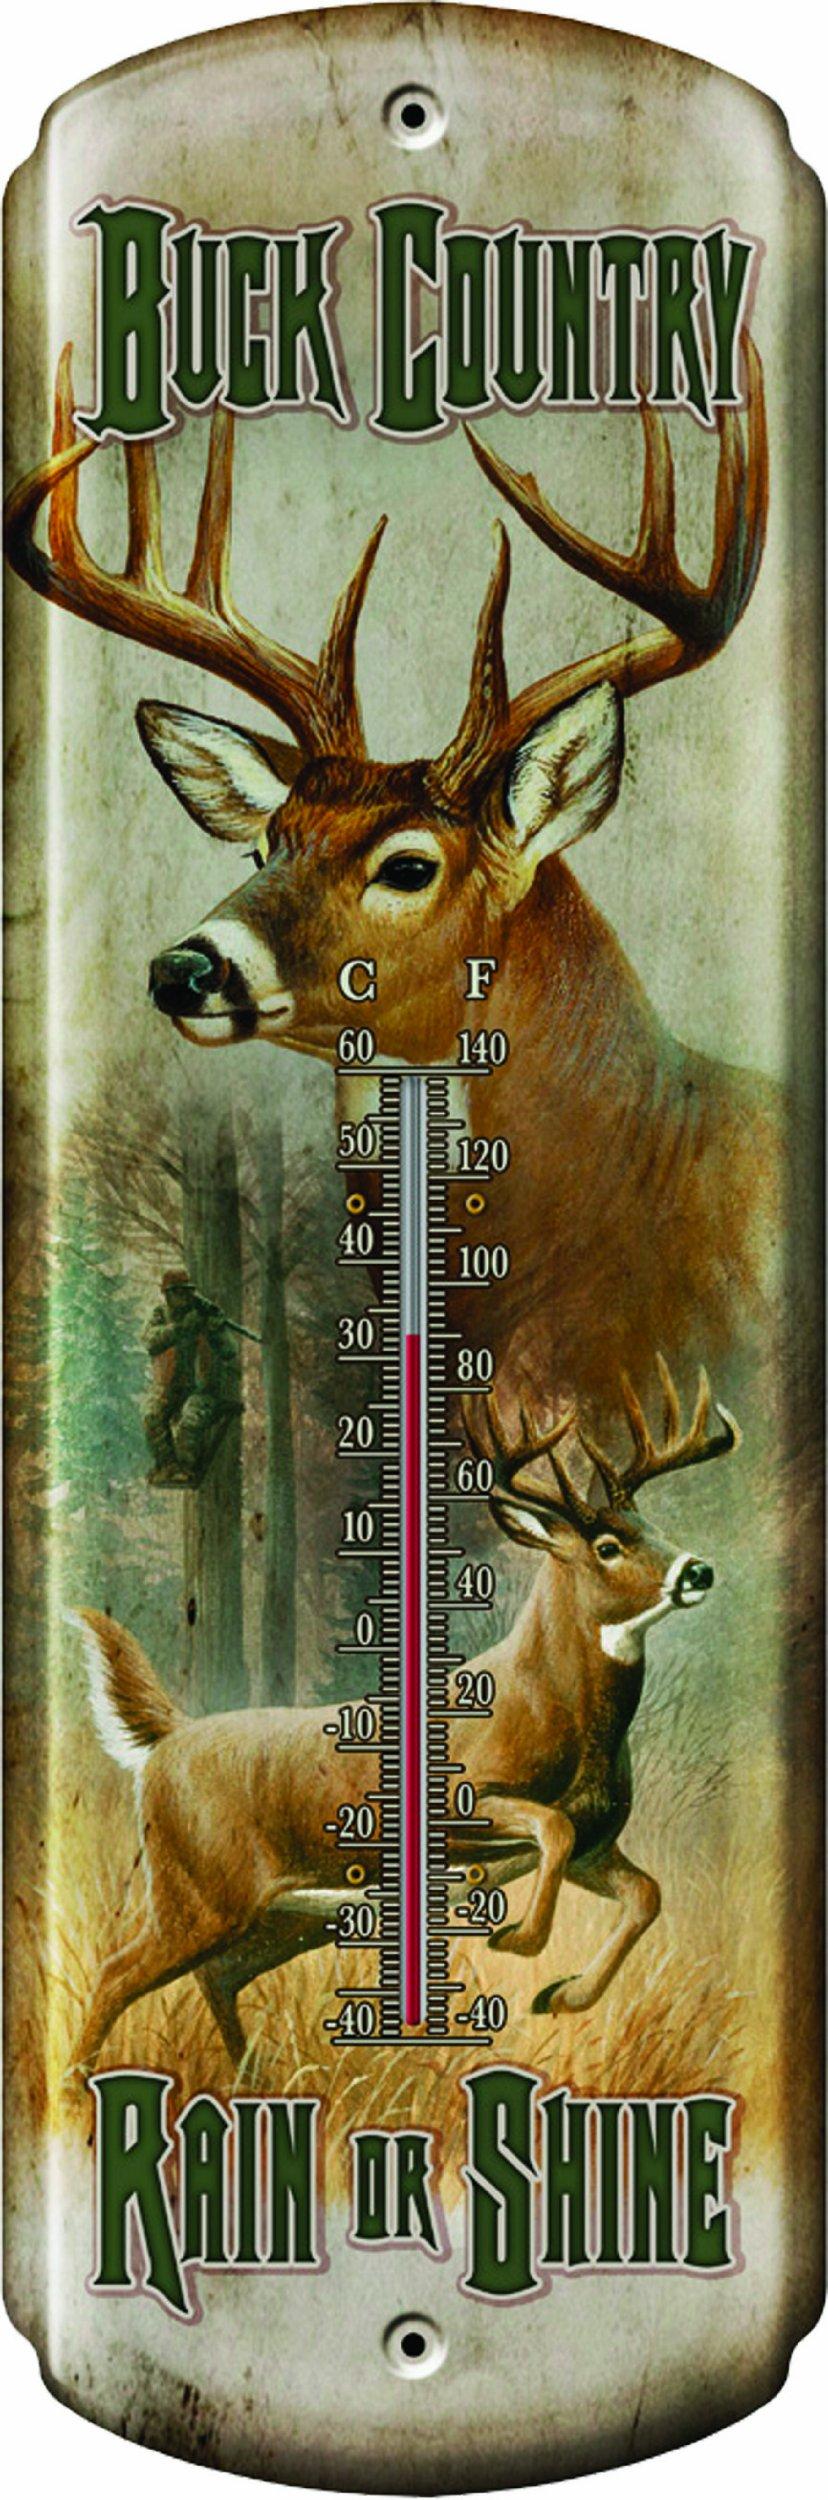 Rivers Edge Buck Country Nostalgic Tin Thermometer